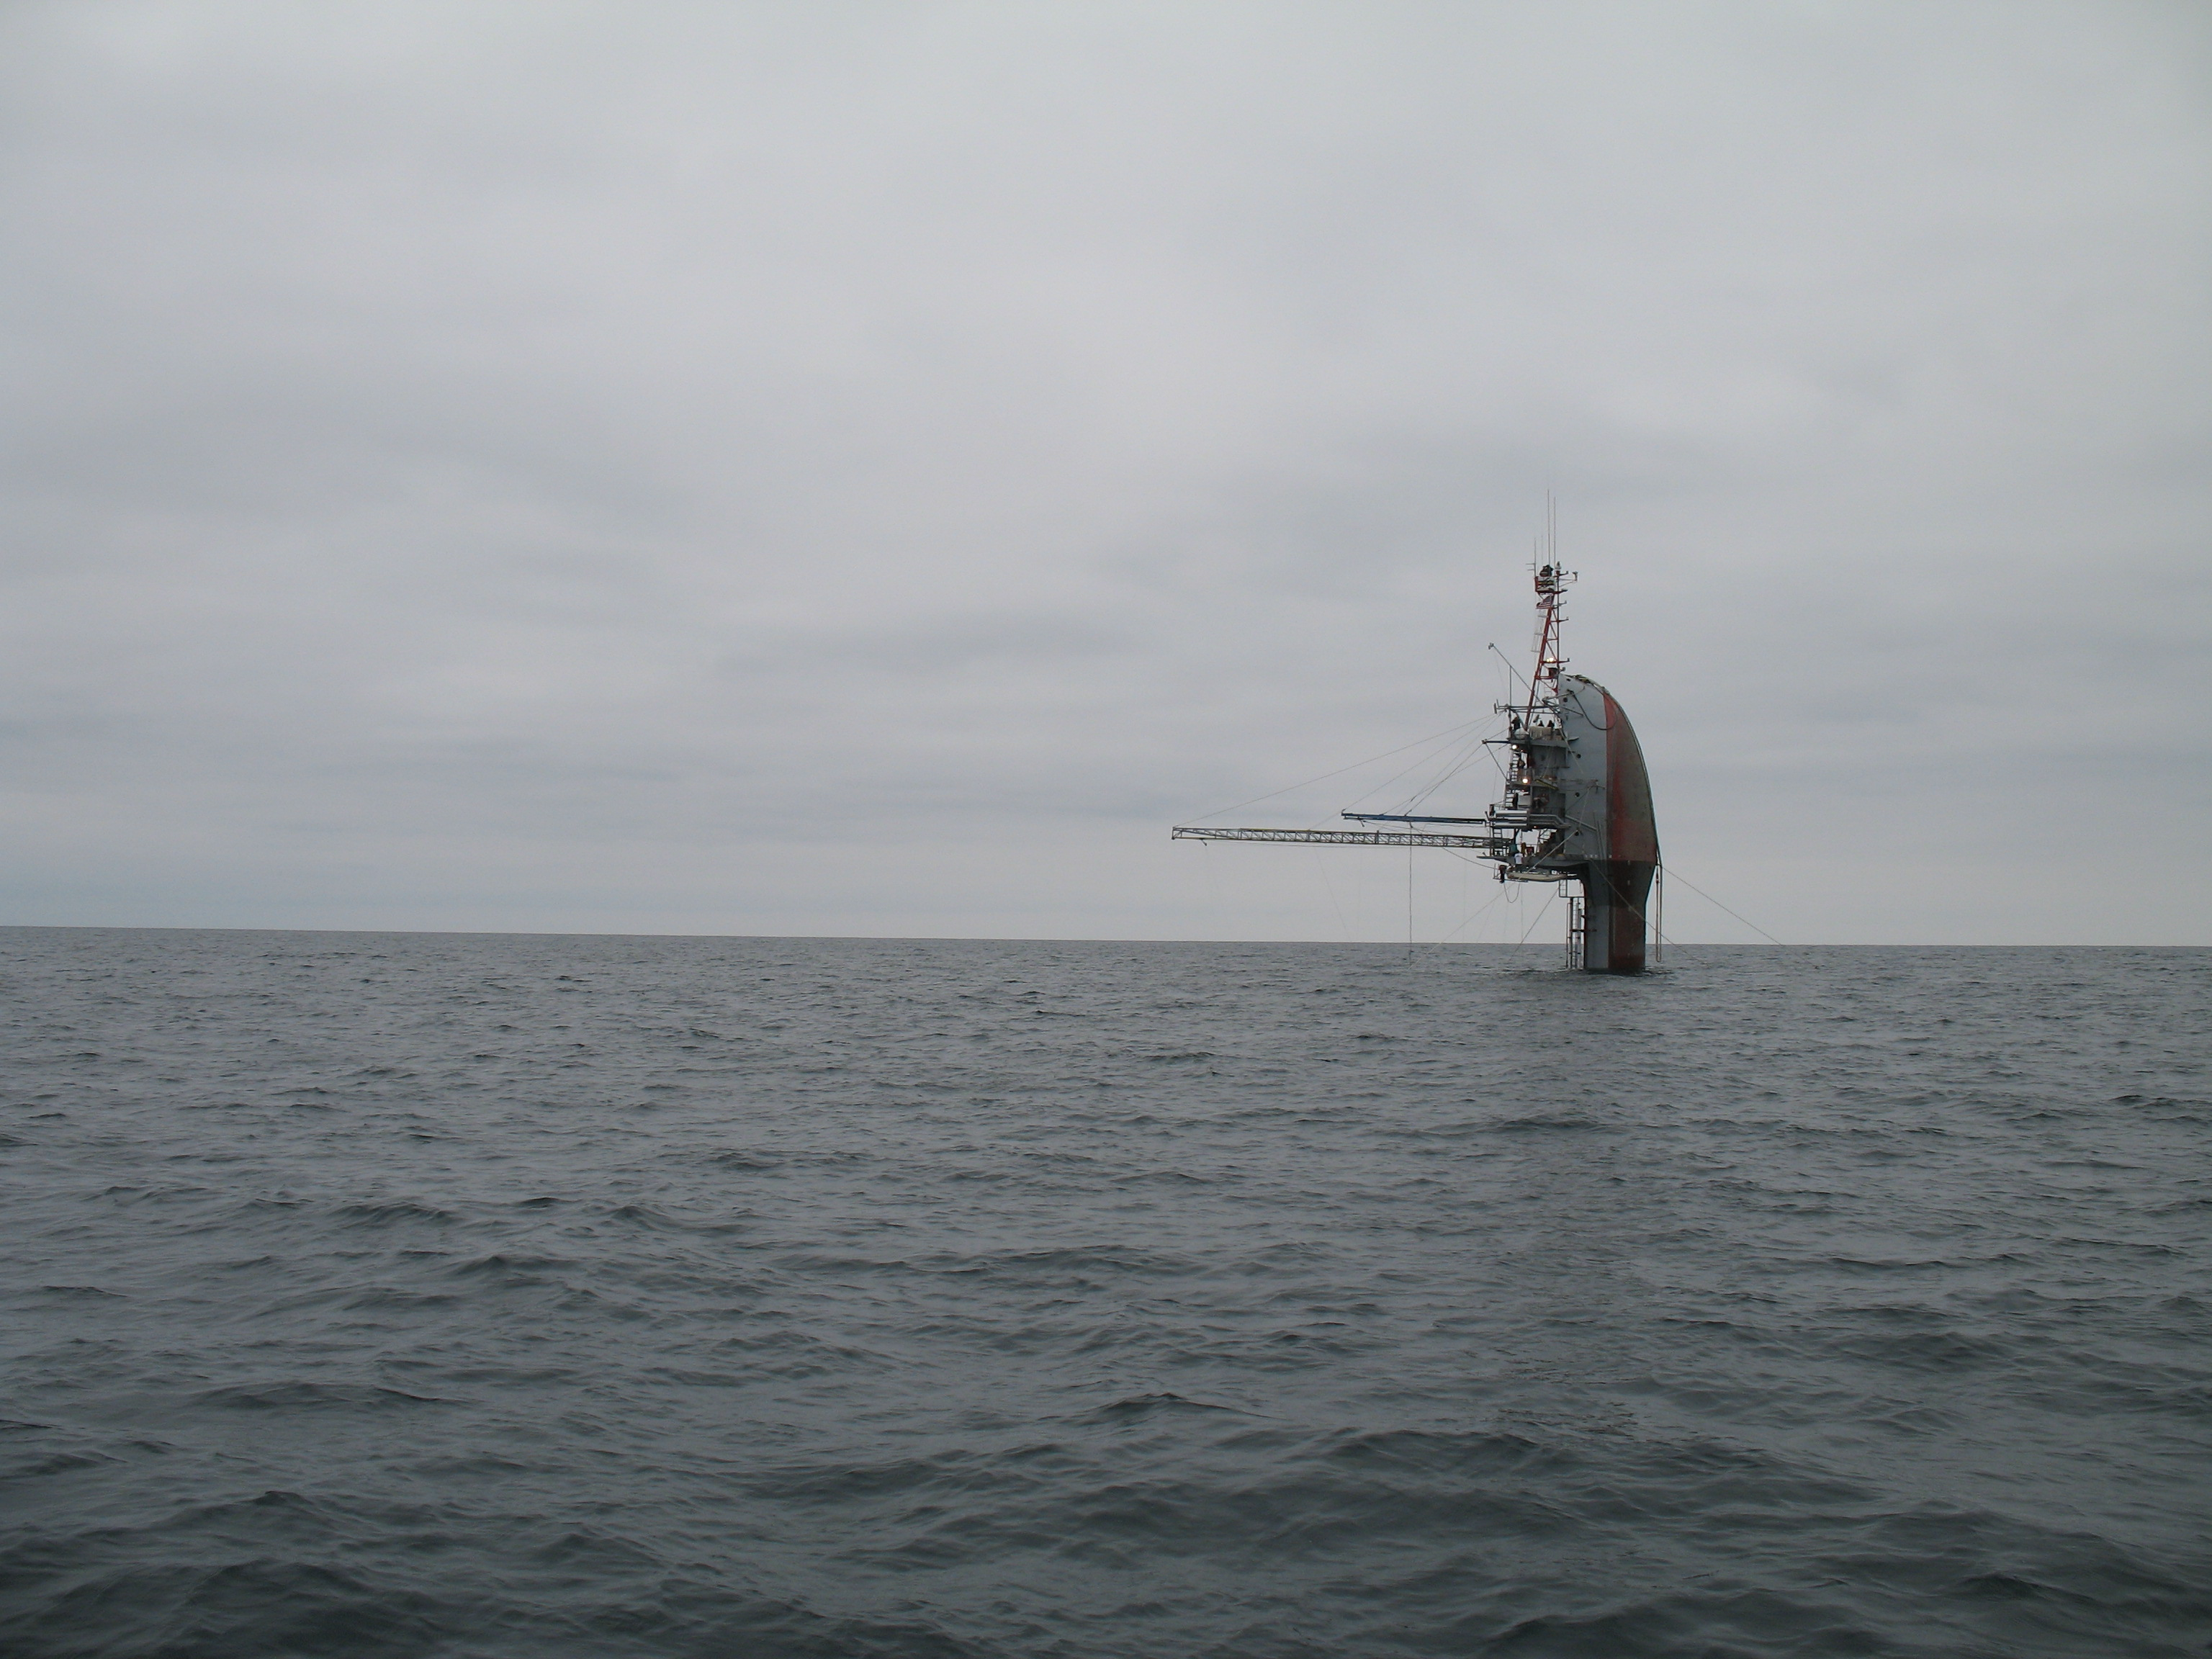 Photo: Sinking Ship?